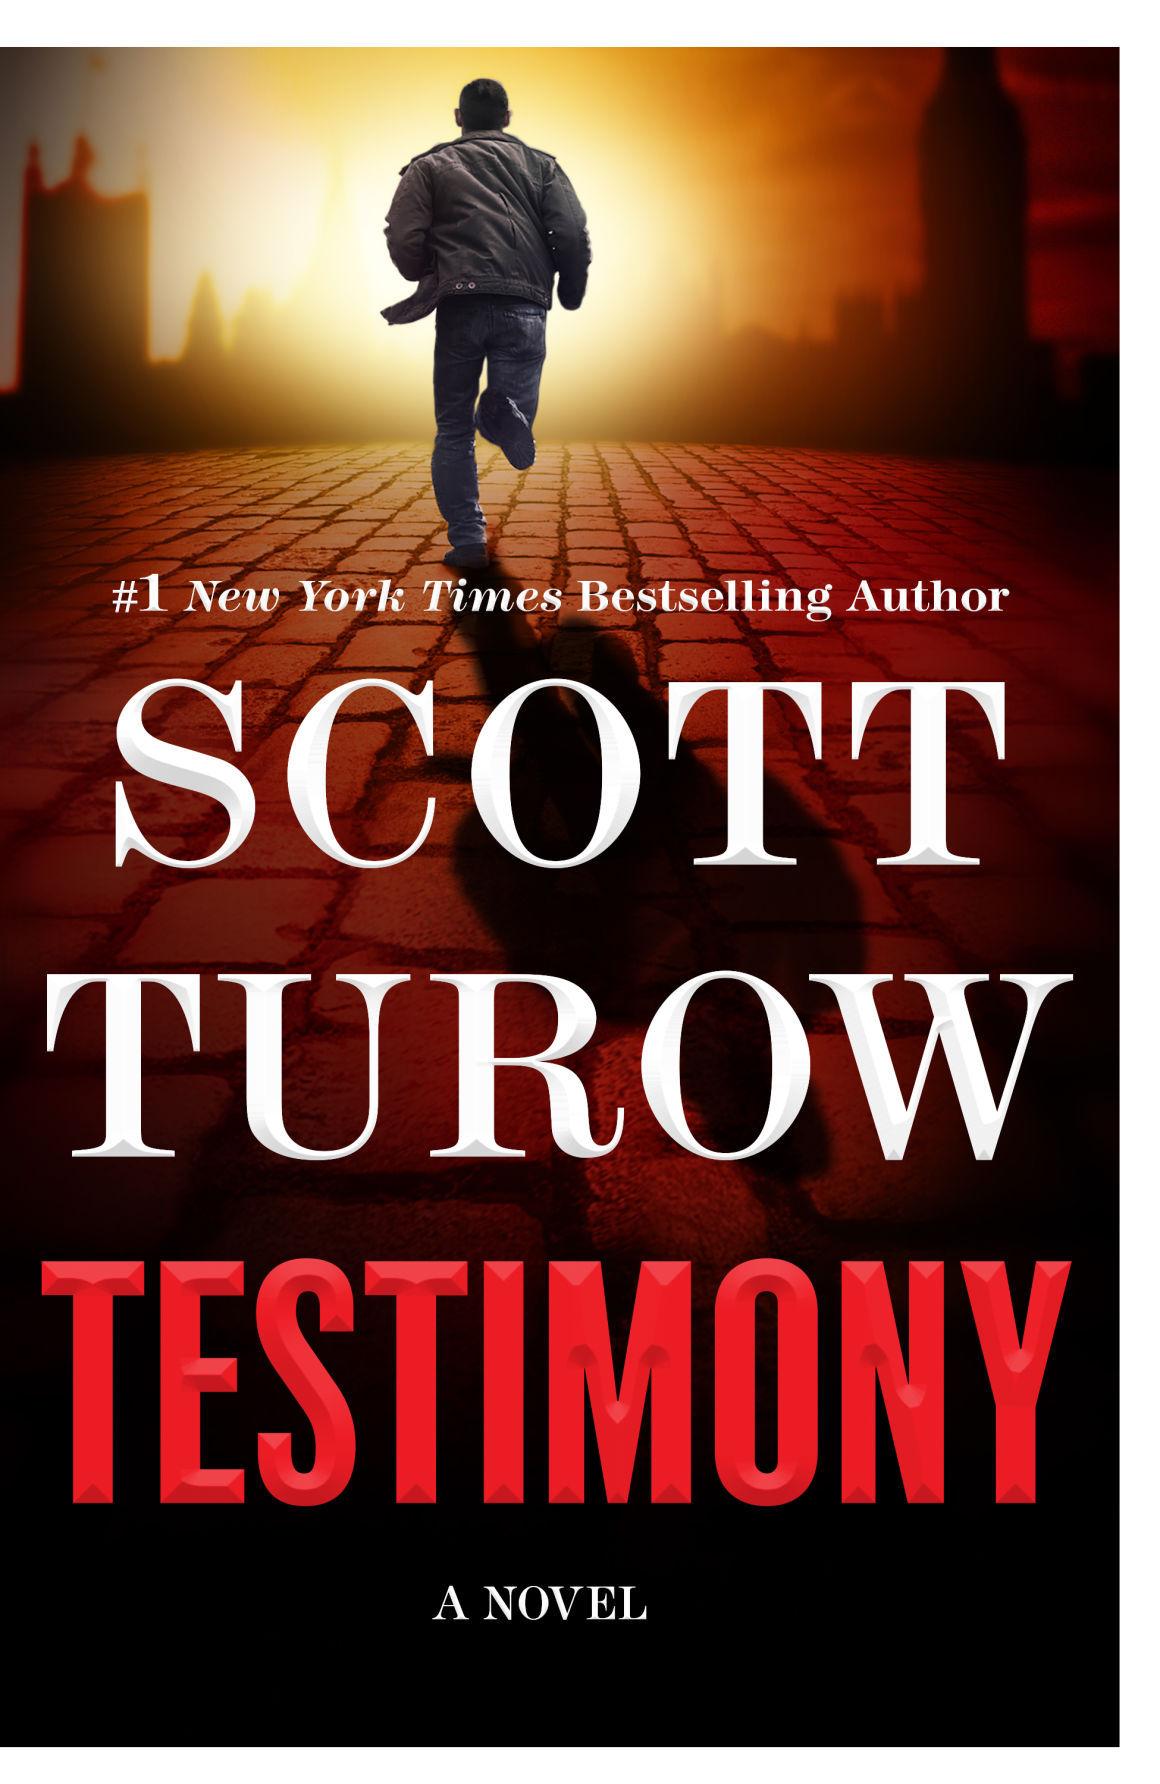 presumed innocent author releases new novel testimony - Presumed Innocent Book